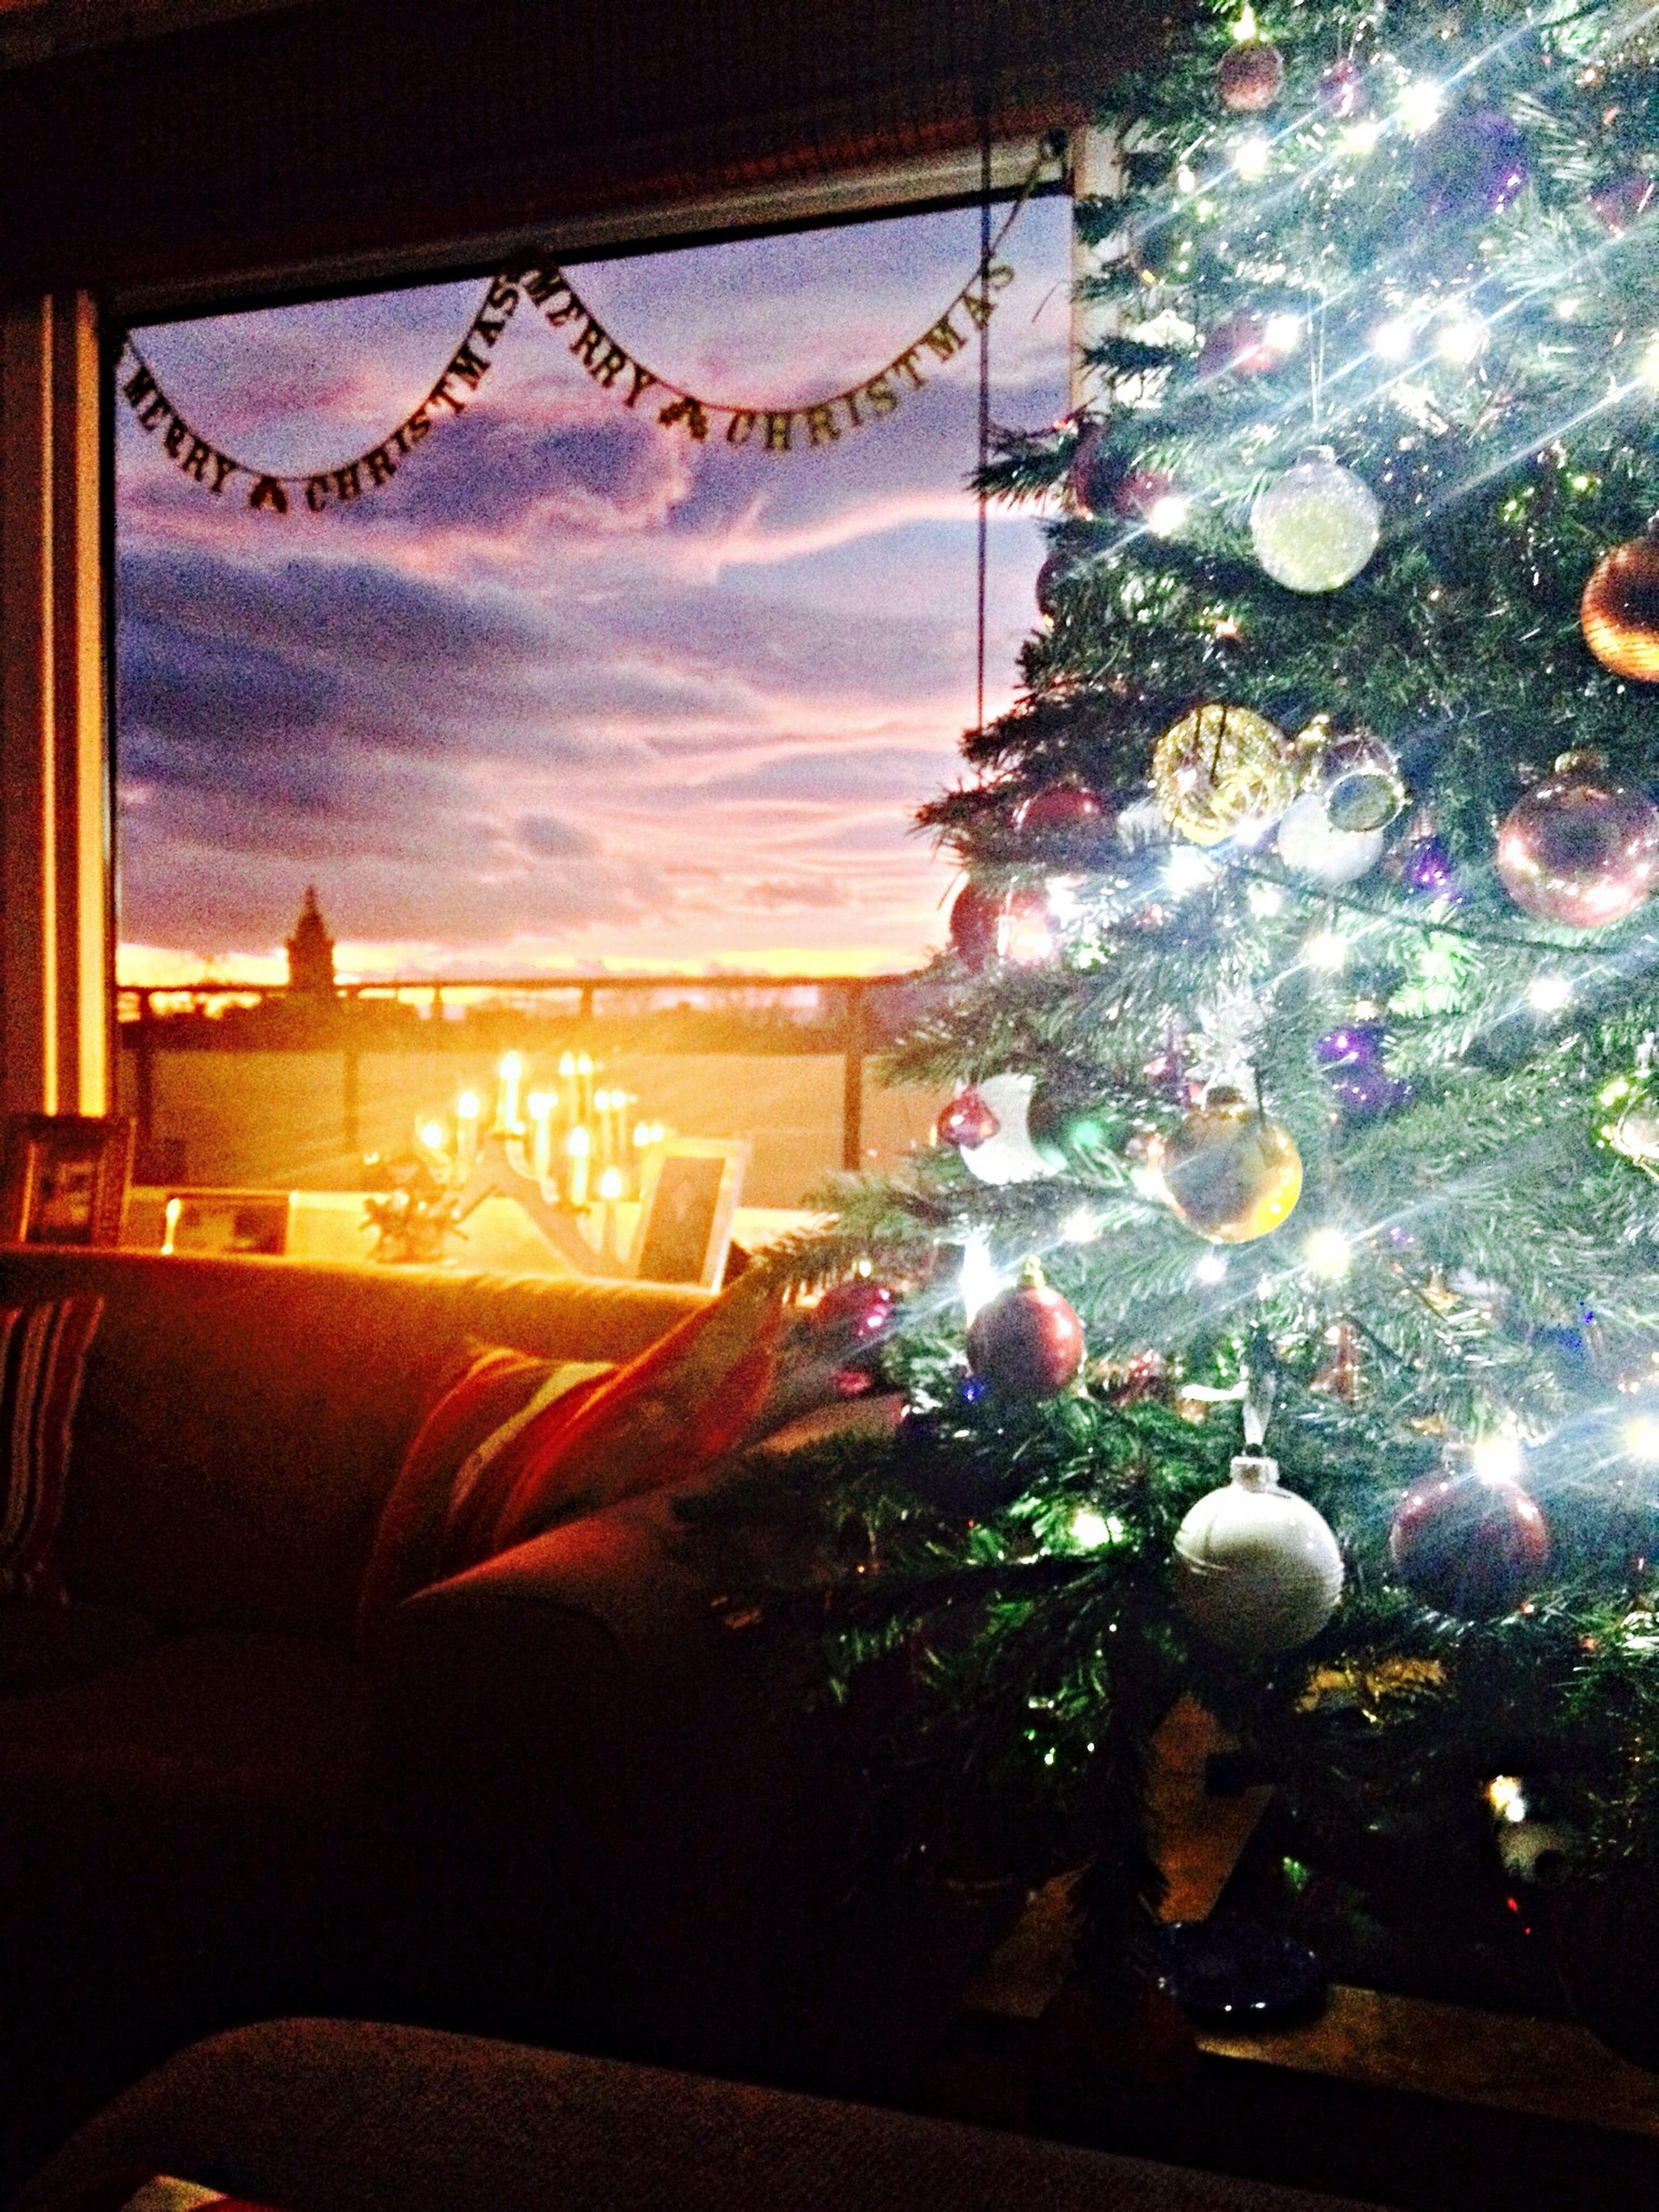 indoors, christmas, tree, window, christmas tree, sunset, celebration, home interior, sky, christmas decoration, illuminated, no people, christmas lights, architecture, close-up, day